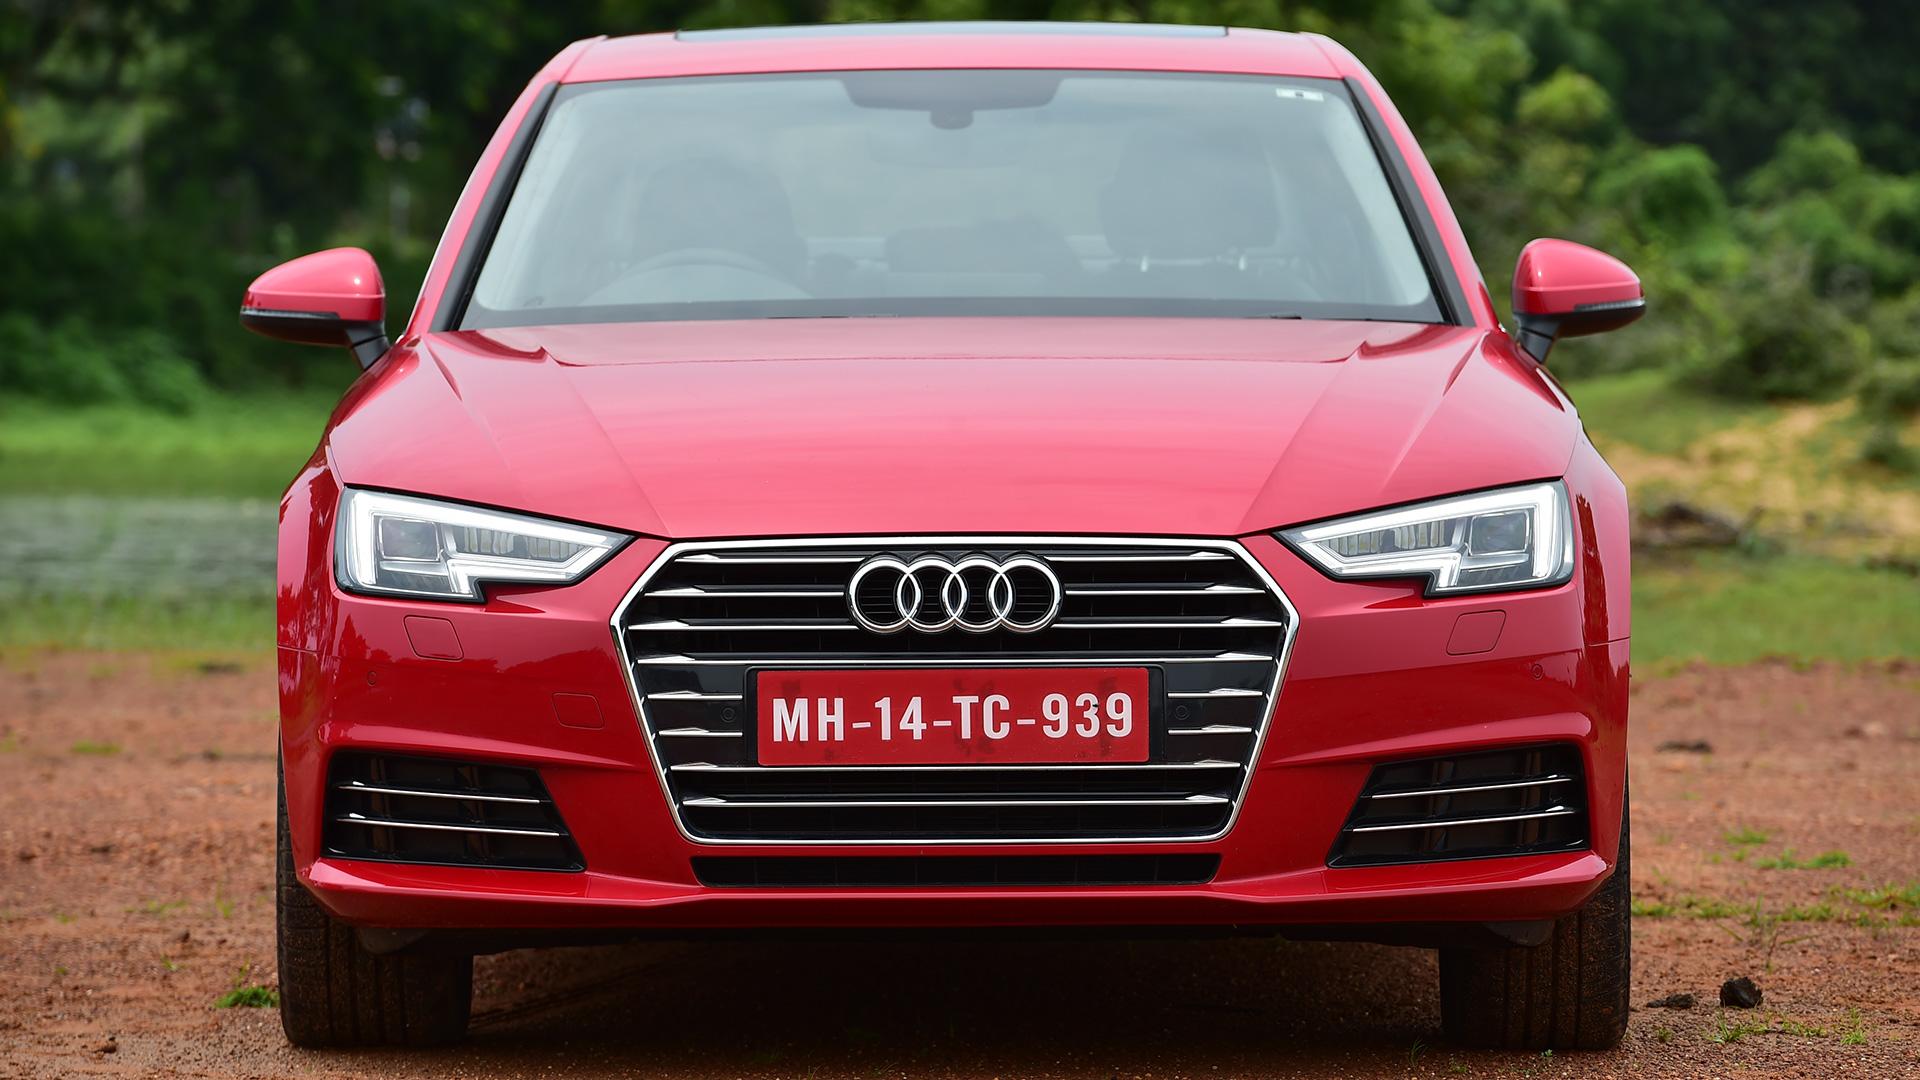 Audi A TFSI Technology Compare Car Photos Overdrive - Audi a4 comparable cars